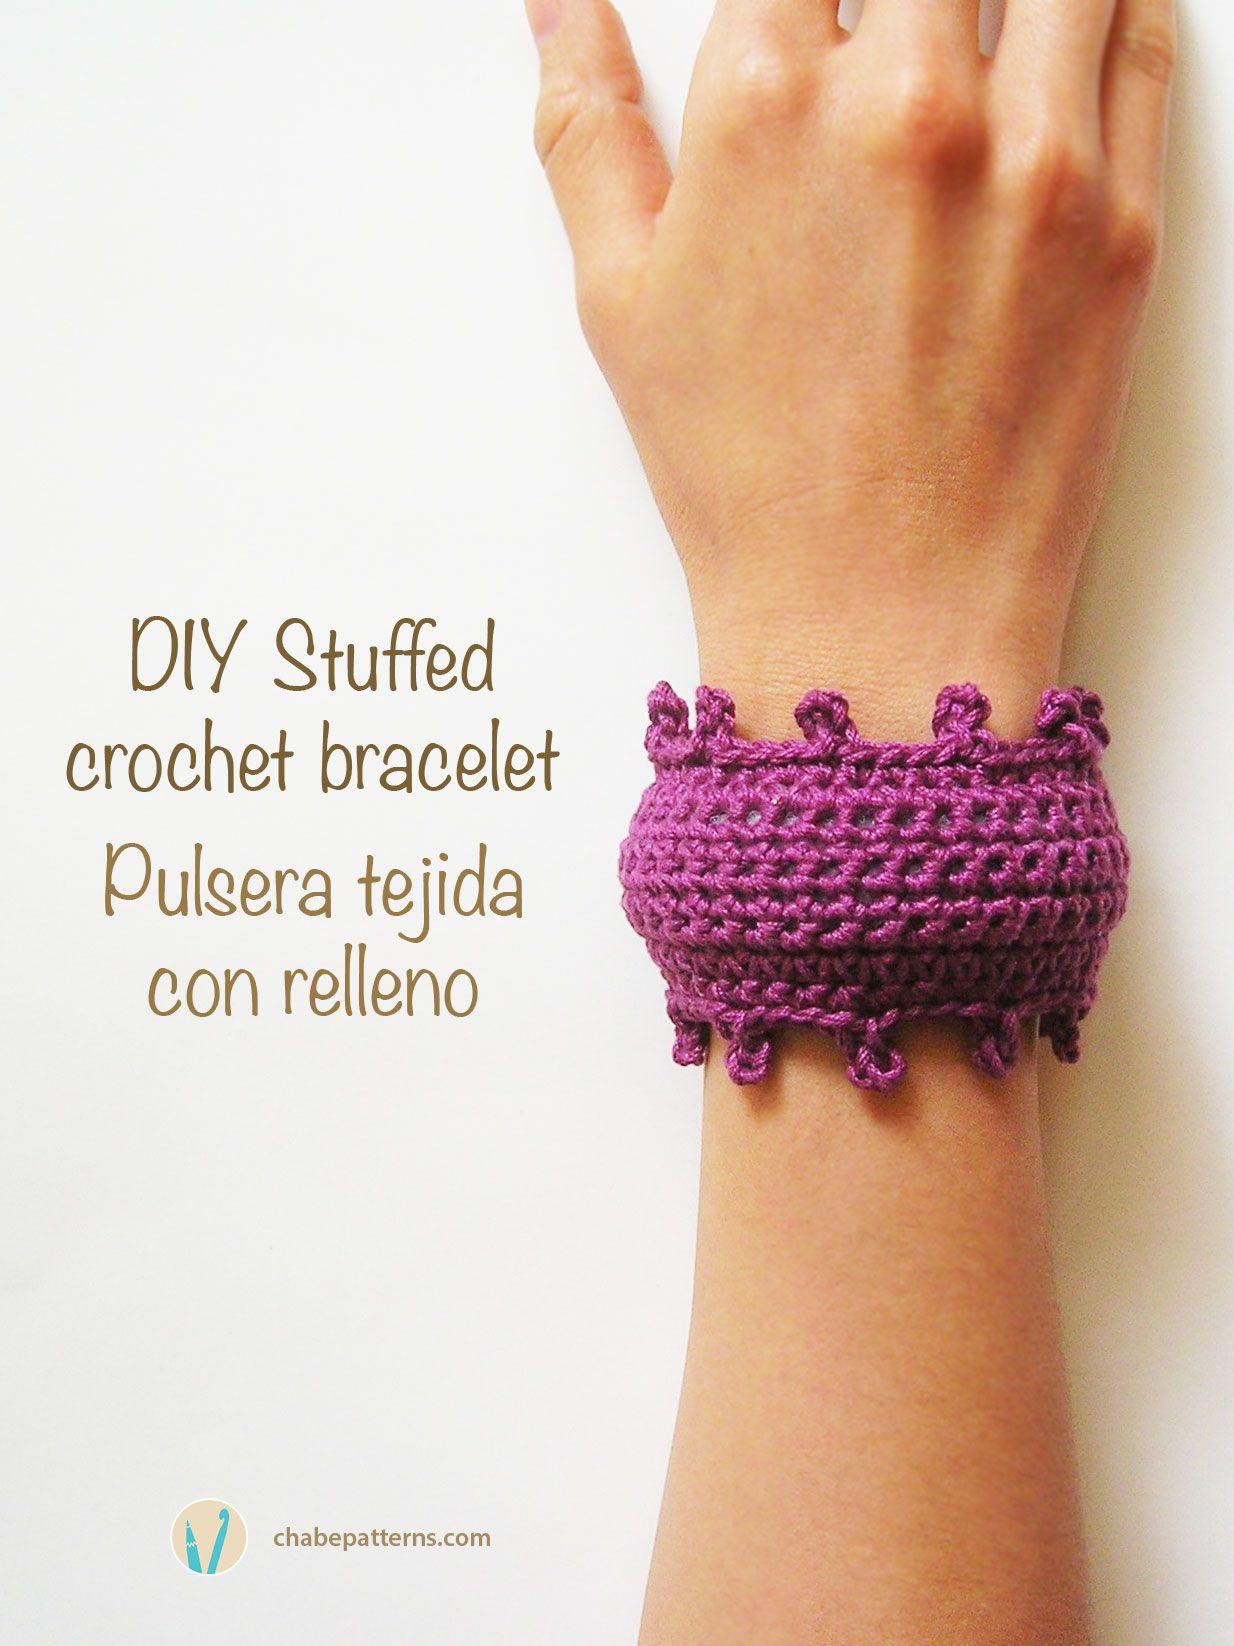 Pin de Concepcion Padilla Oliva en Croche | Pinterest | Croché ...